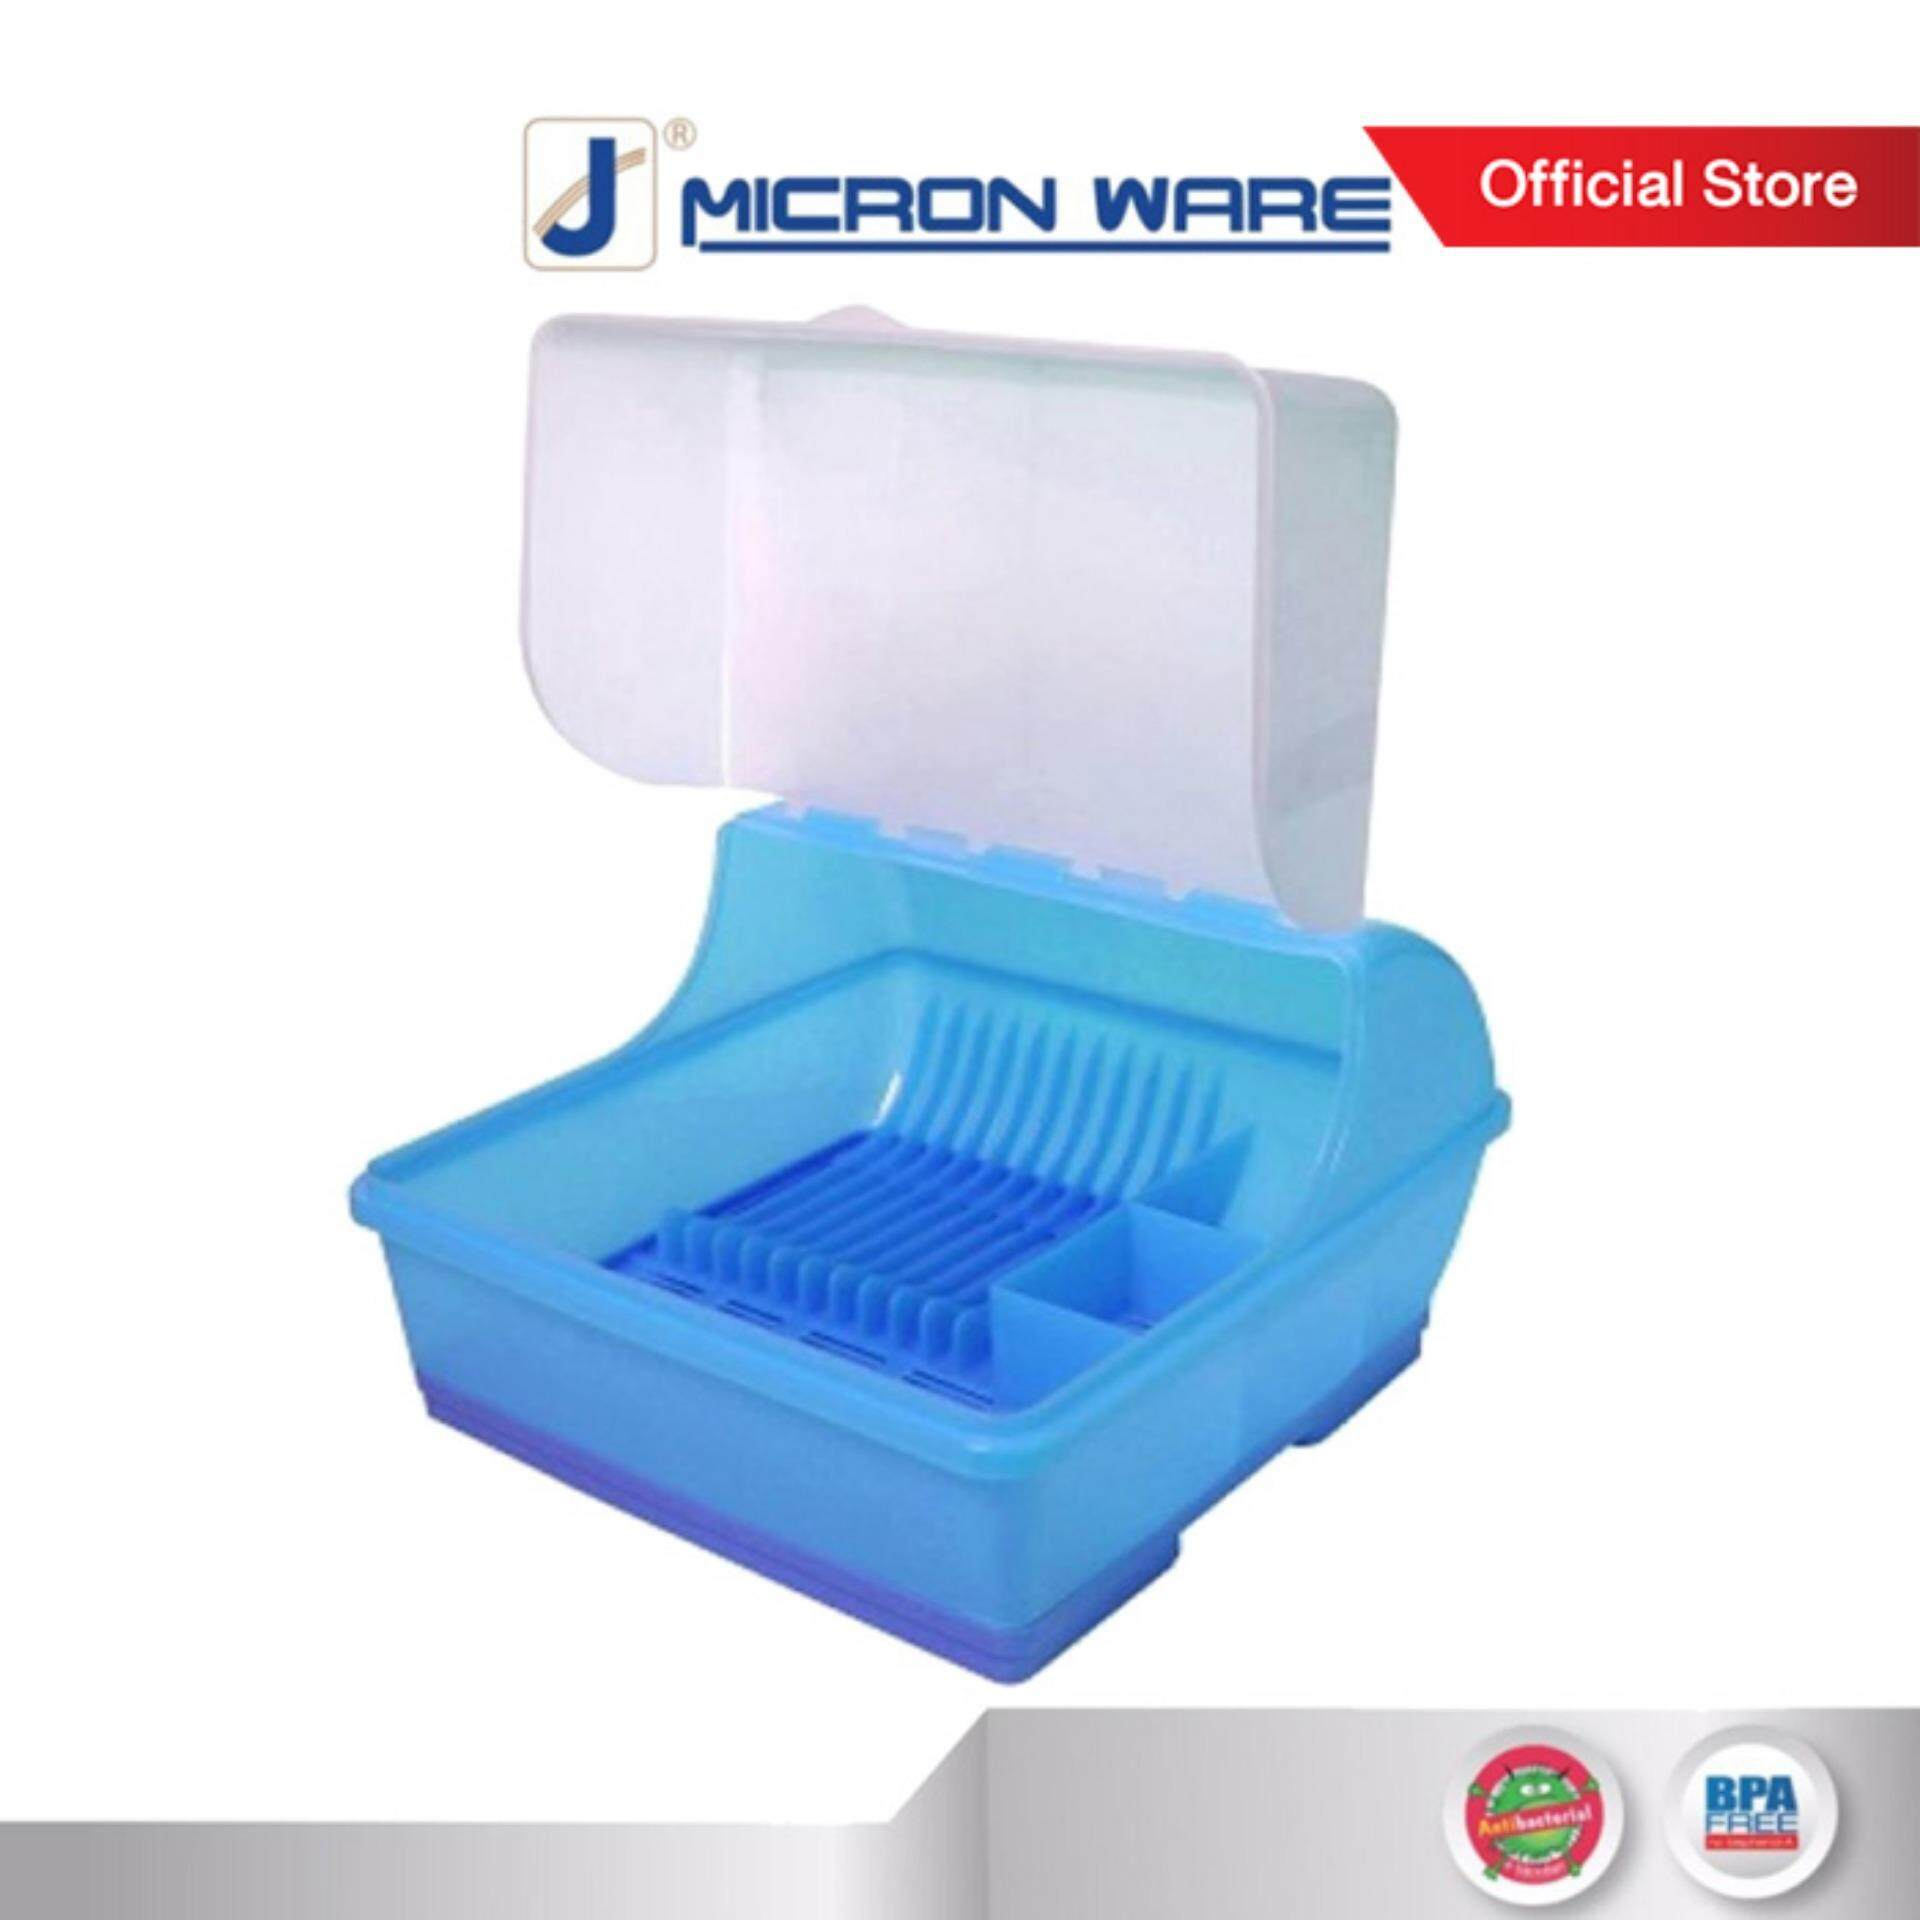 Micronware ที่คว่ำจานพลาสติก พร้อมฝาปิด สีฟ้า 5588 ช่องใส่ช้อนส้อม เพื่อความสะดวก ใช้งานง่าย Super Lock superlock ซุปเปอร์ล็อค